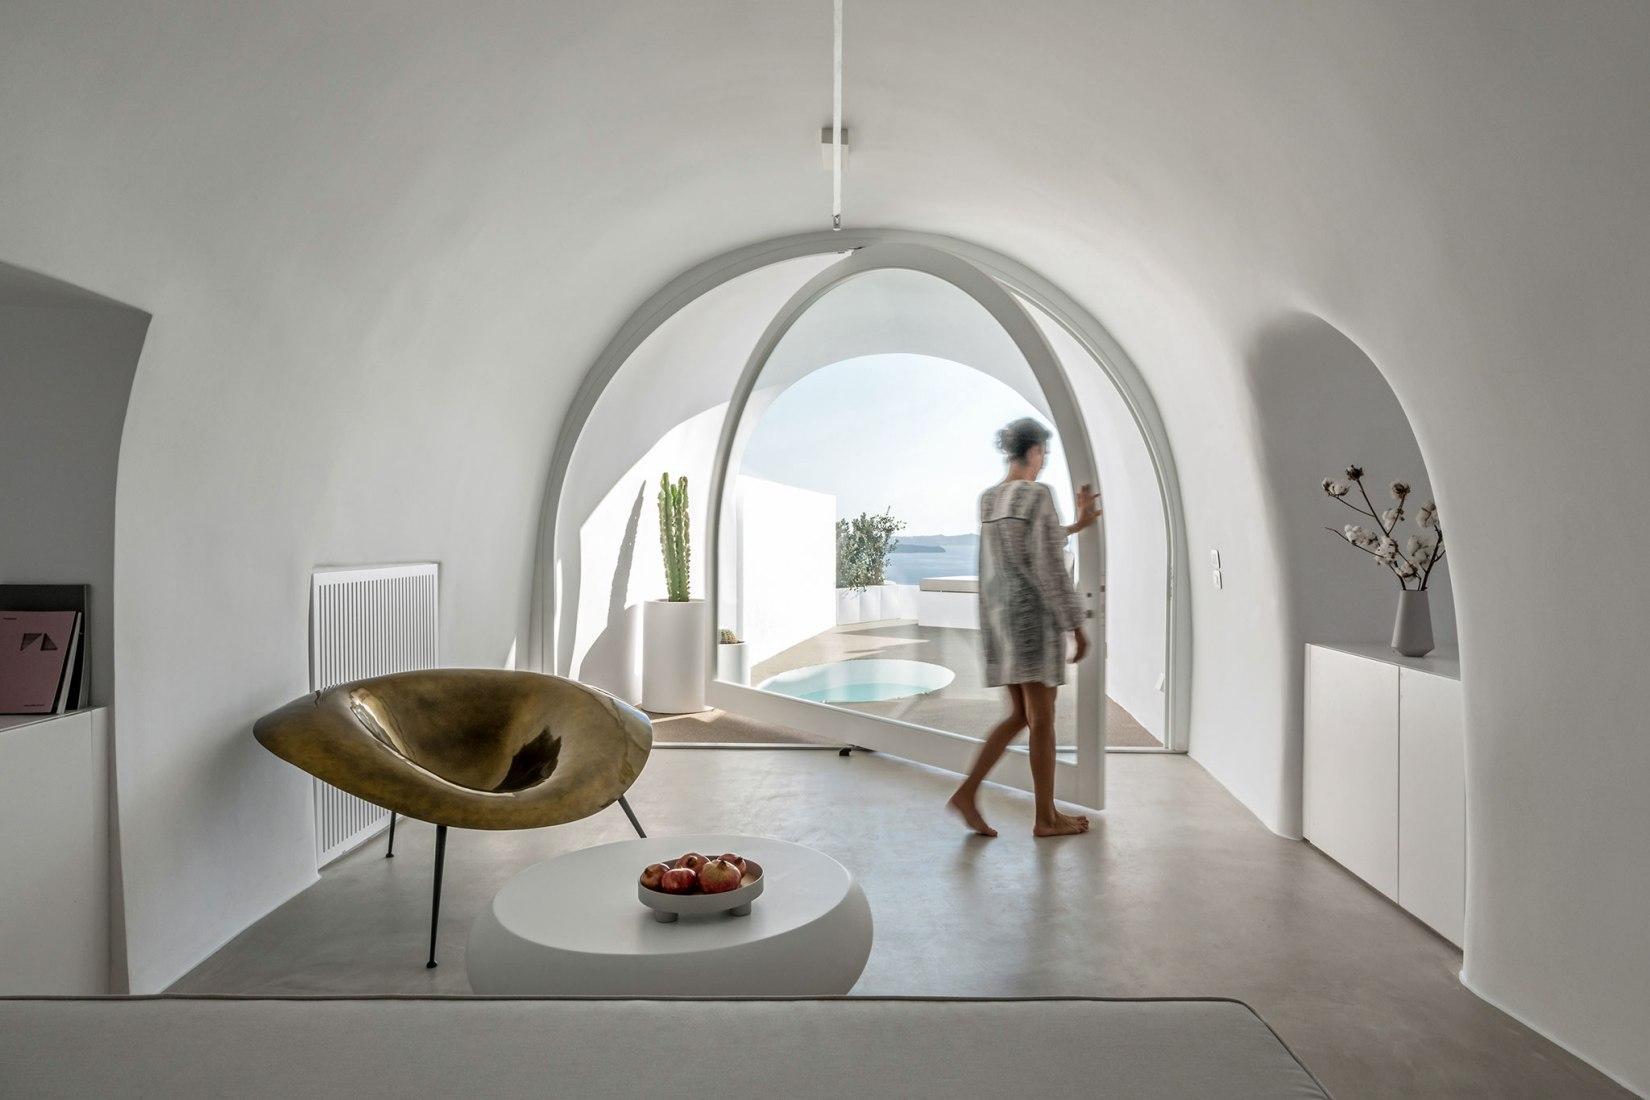 Saint Hotel en Oia por Kapsimalis Architects. Fotografía por Giorgos Sfakianakis